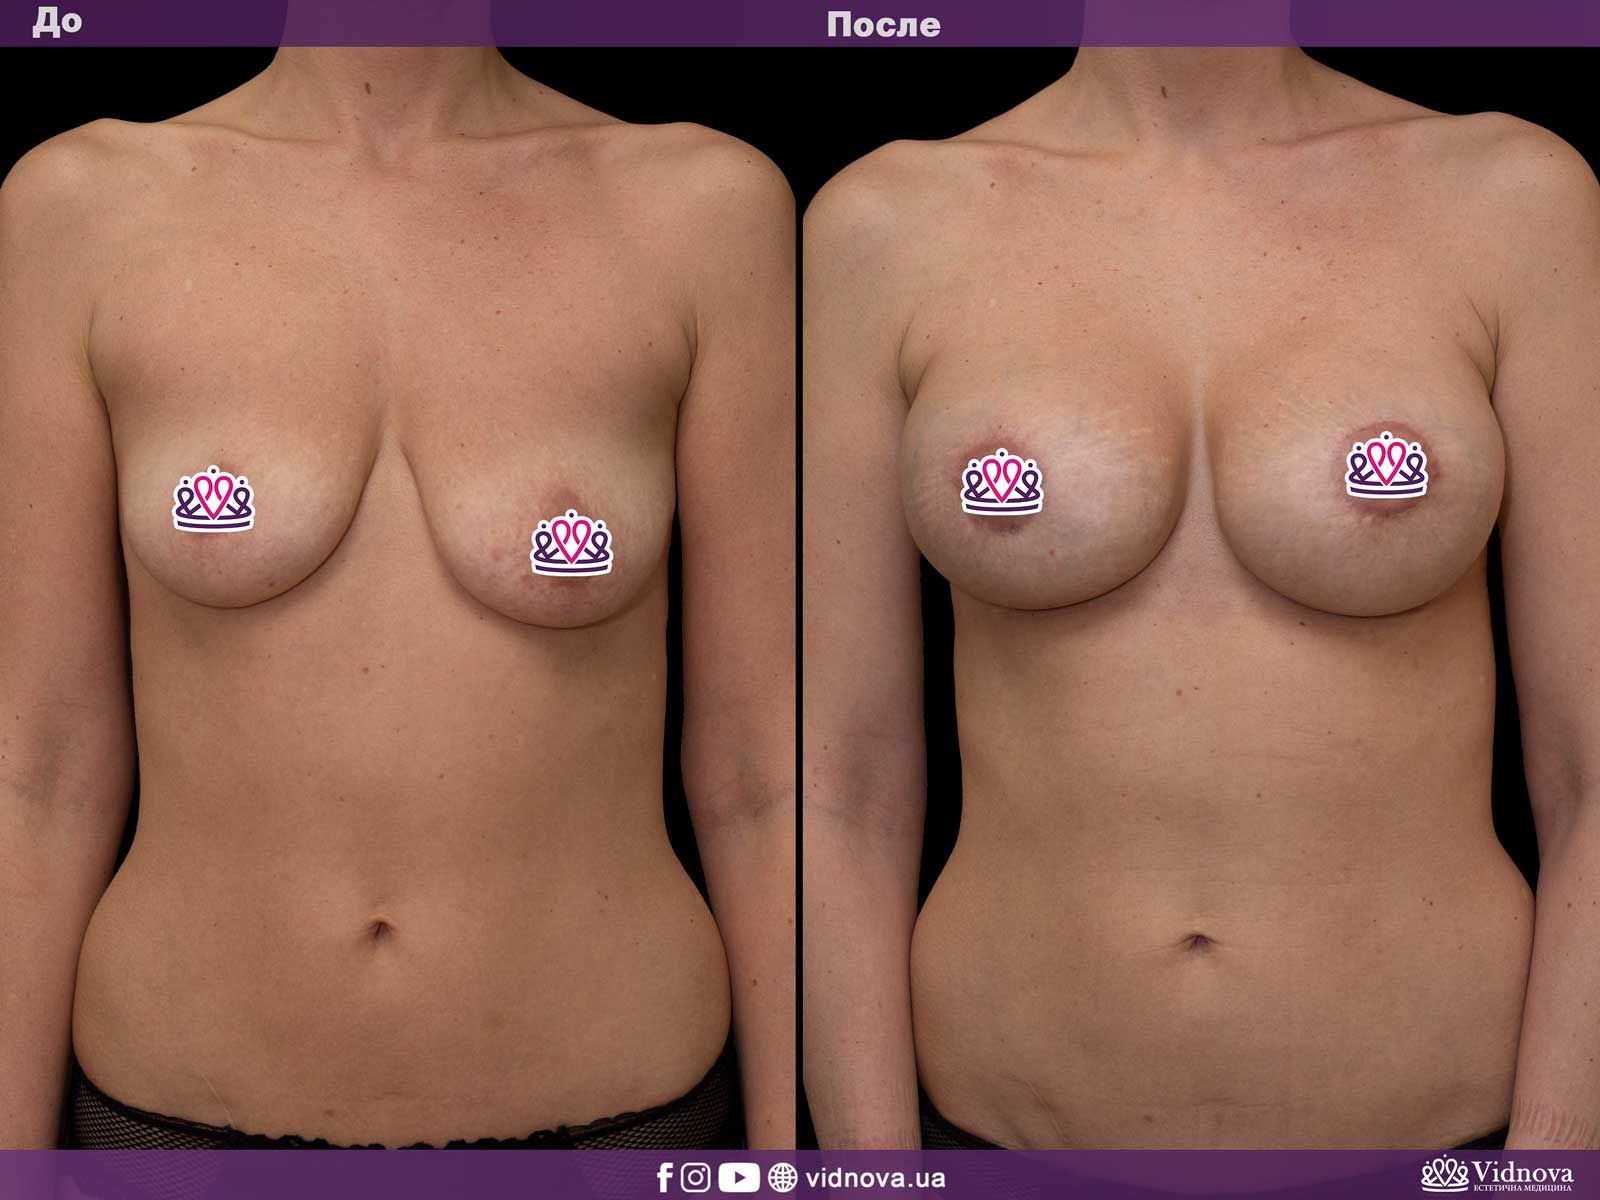 Подтяжка груди: Фото ДО и ПОСЛЕ - Пример №13-1 - Клиника Vidnova